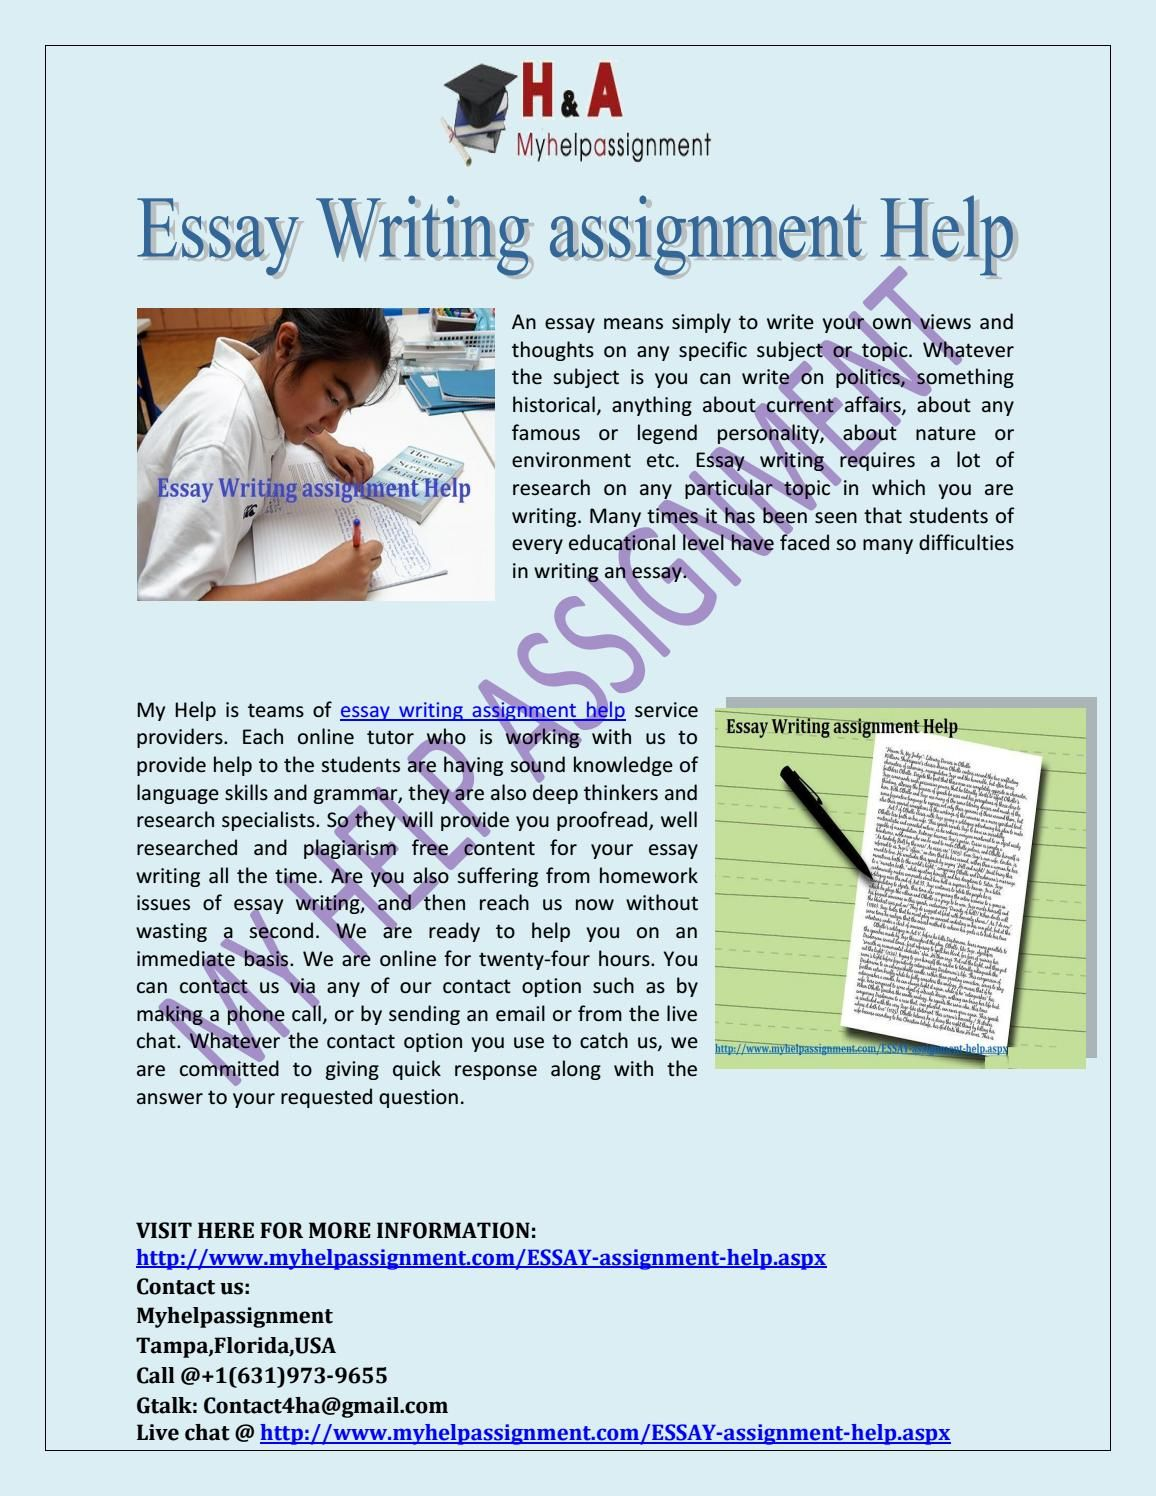 Help correct my essay